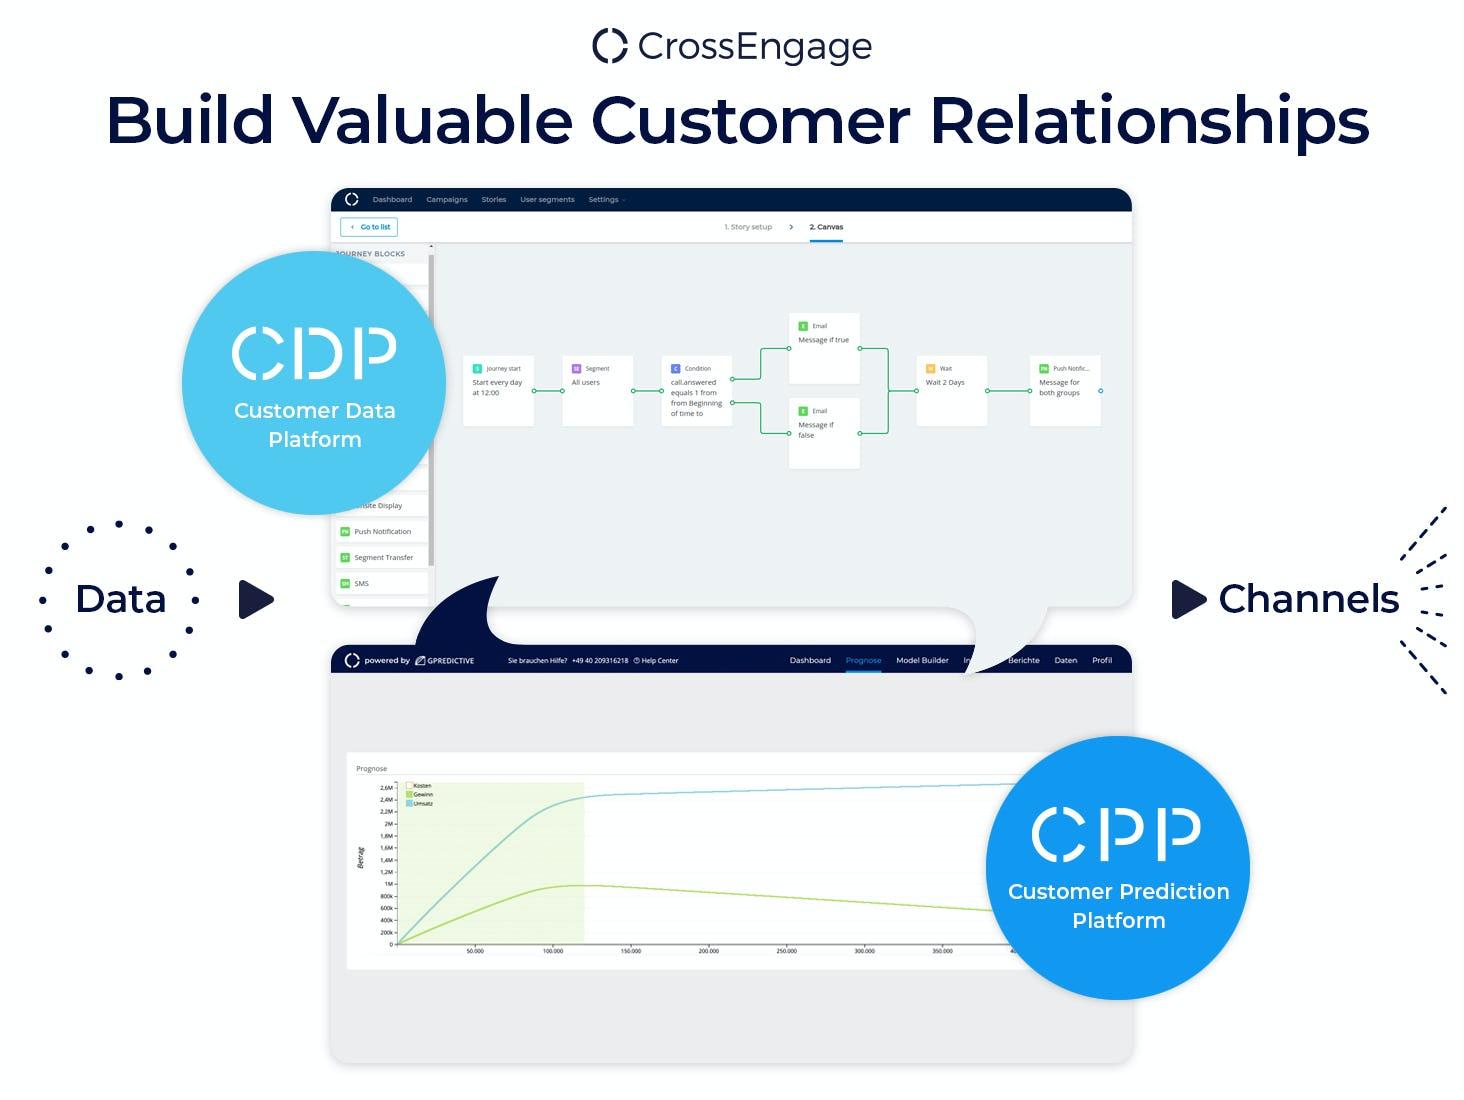 CrossEngage Software - Build Valuable Customer Relationships